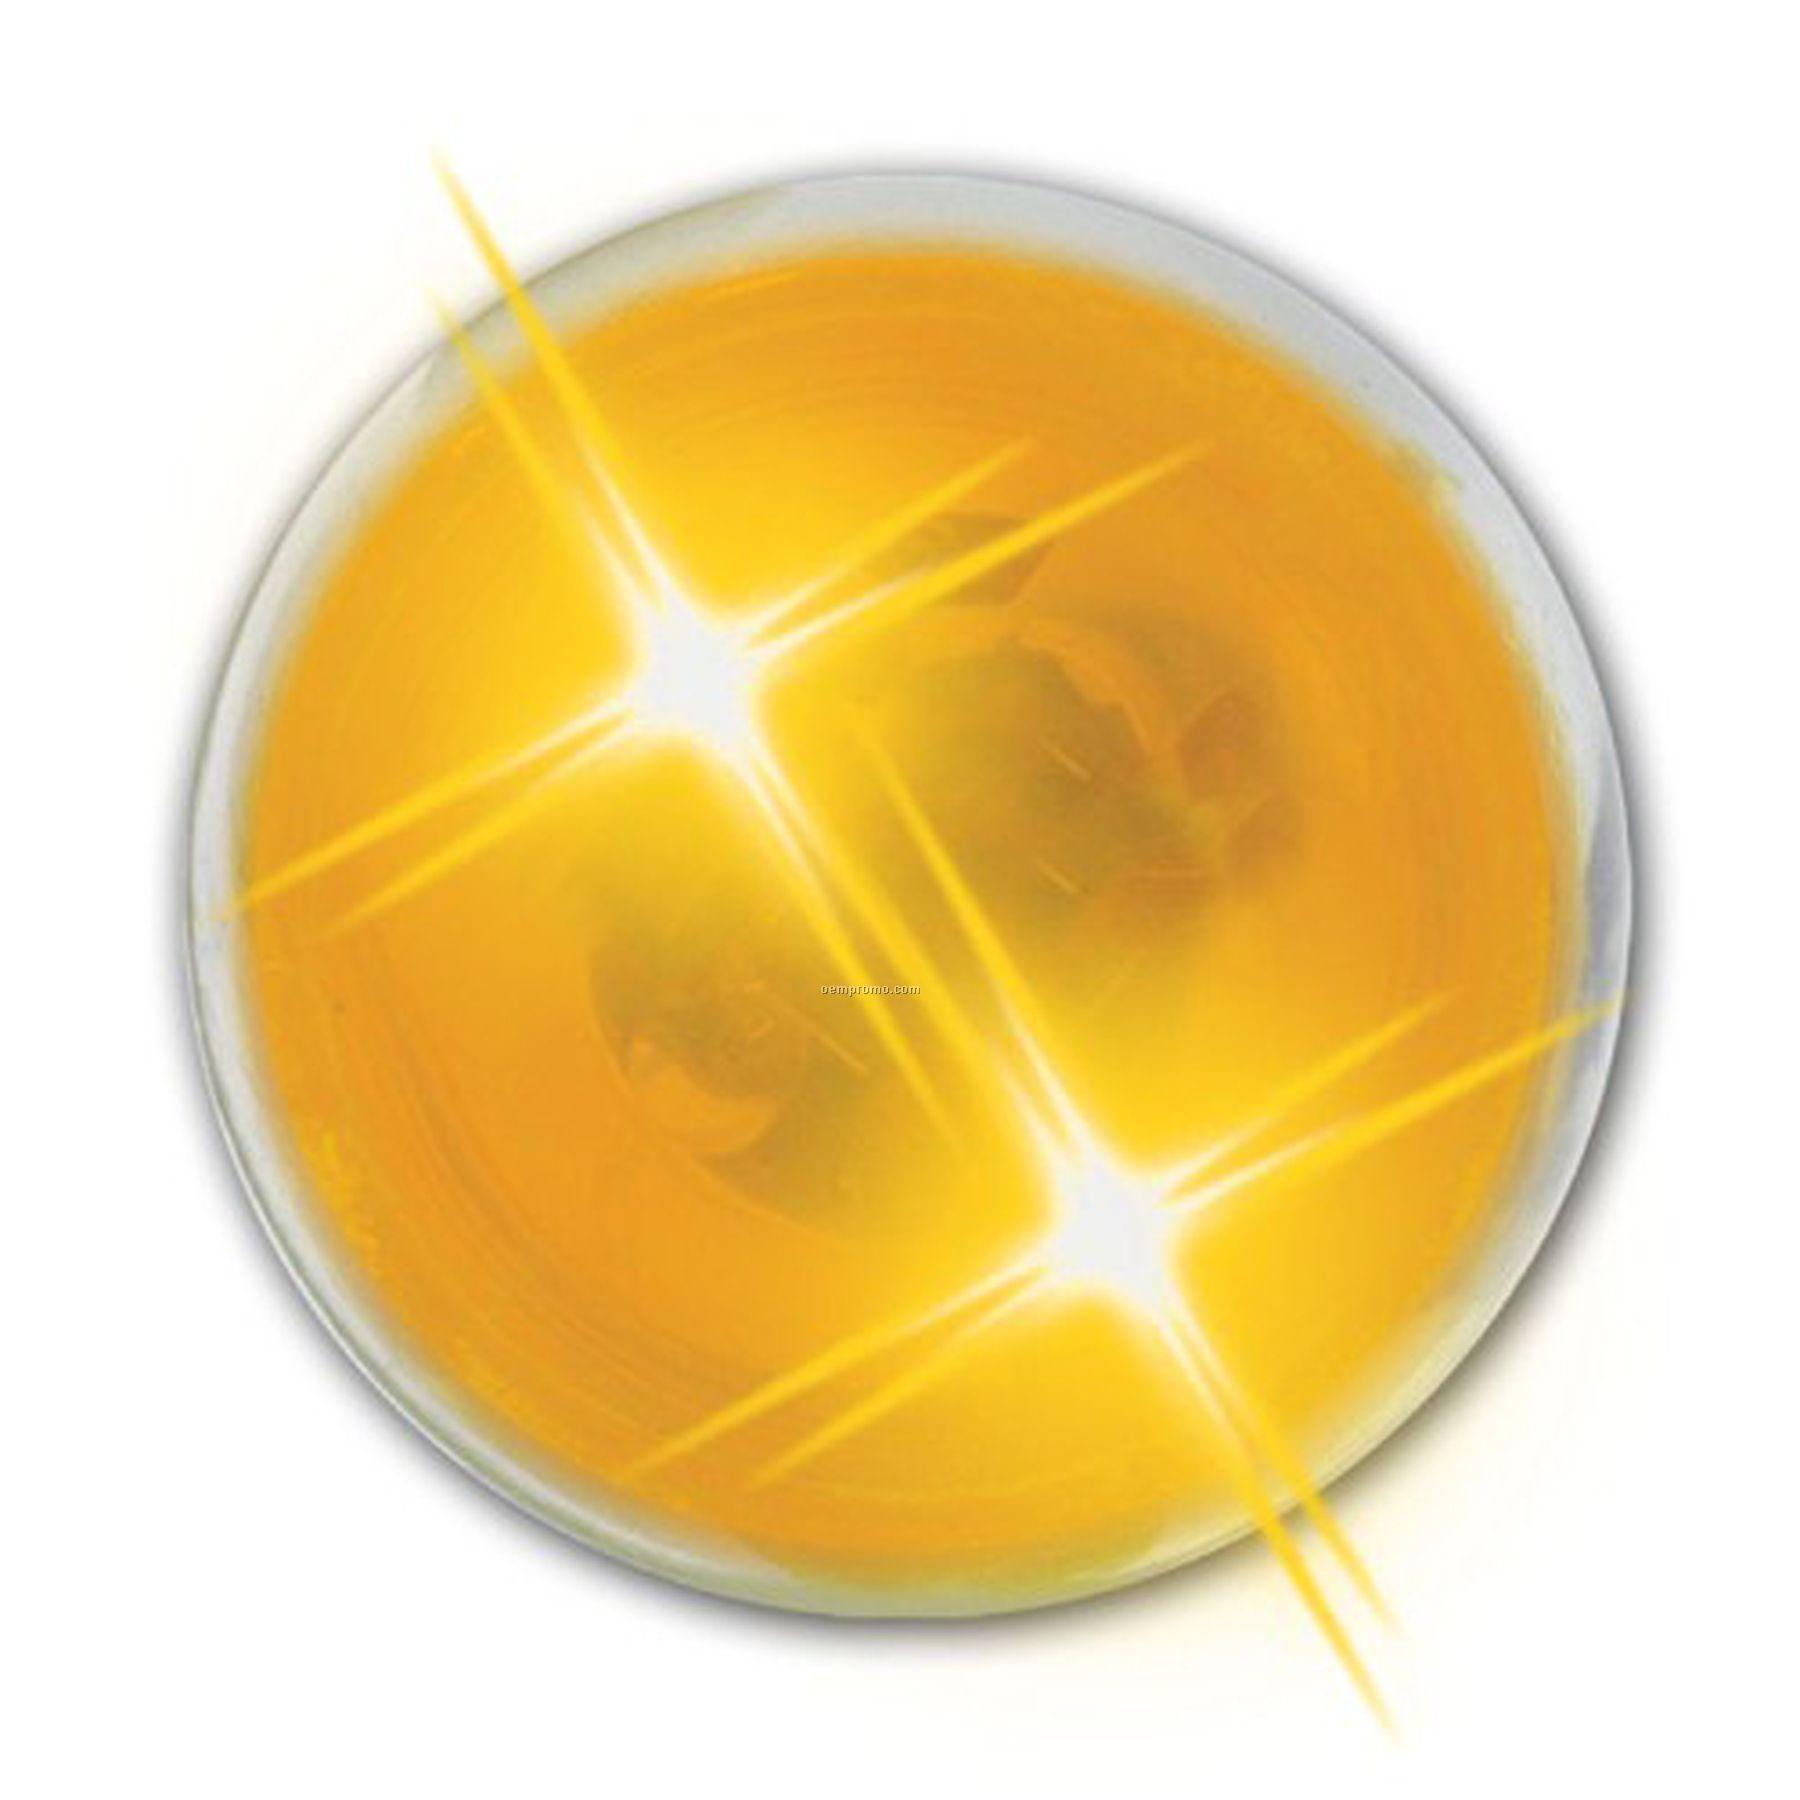 Lightup Bouncing Buzball - Yellow Ball With Yellow Leds (Inside Imprint)